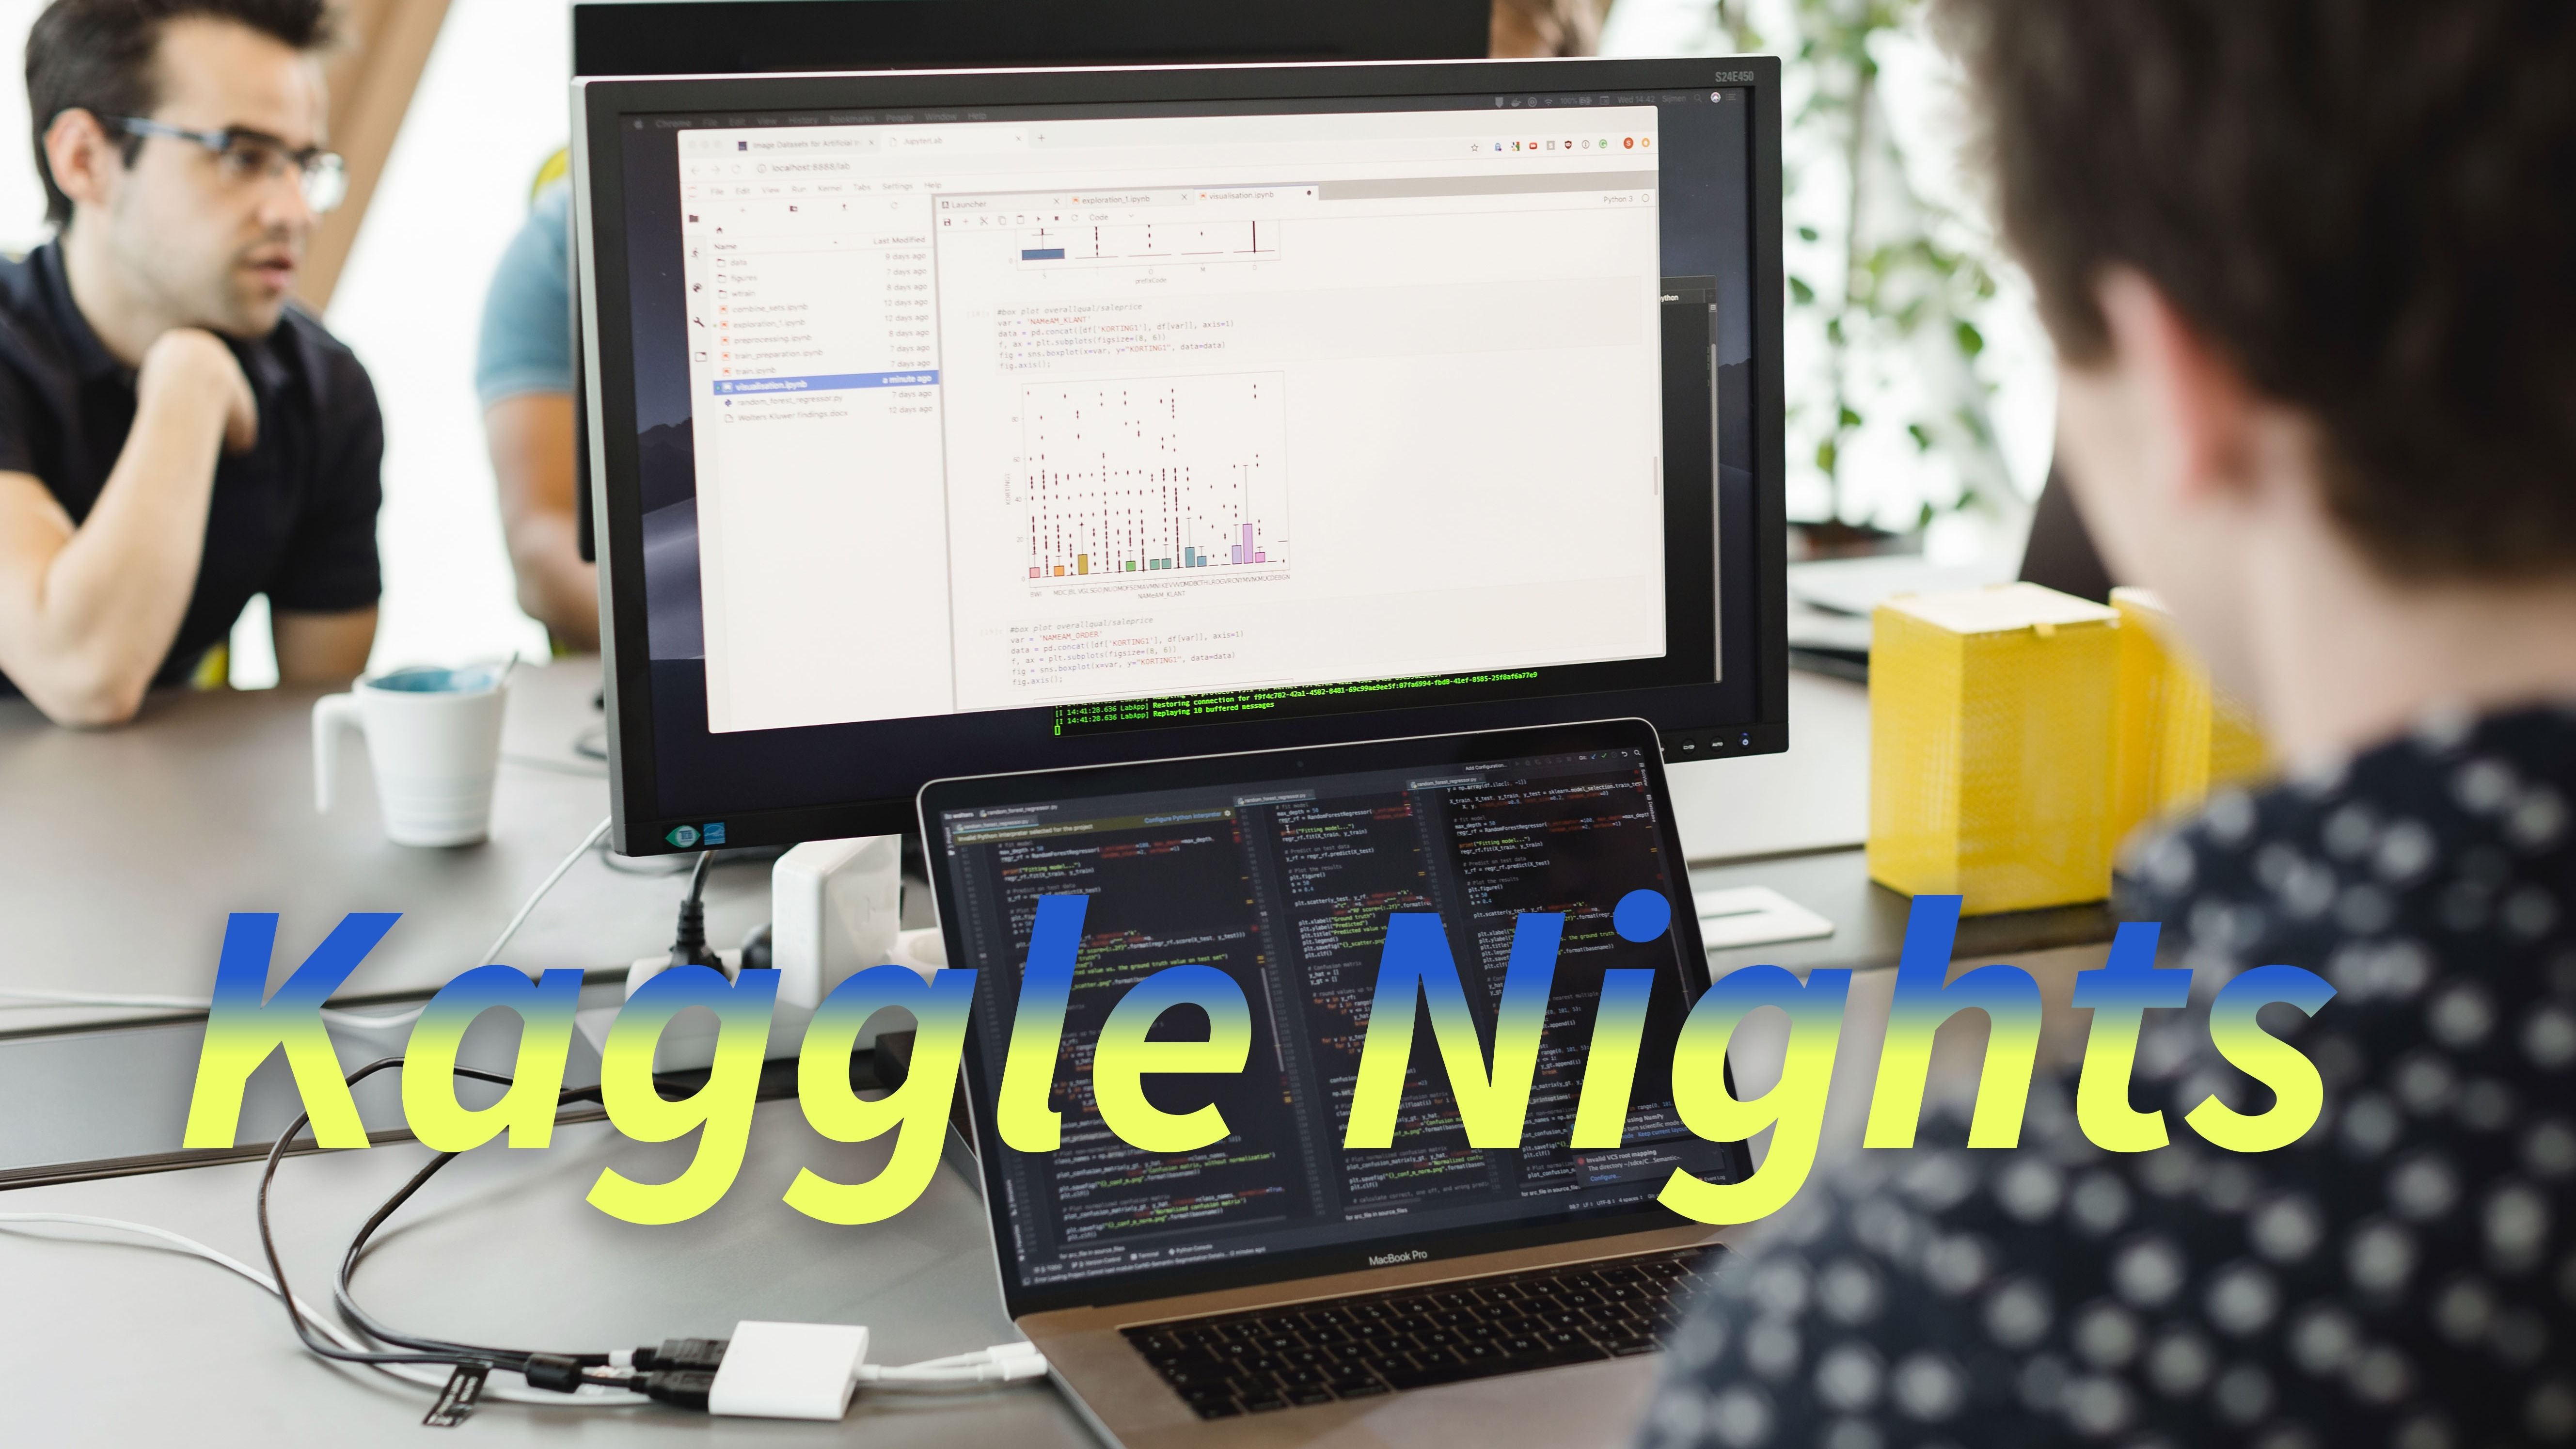 Kaggle Nights